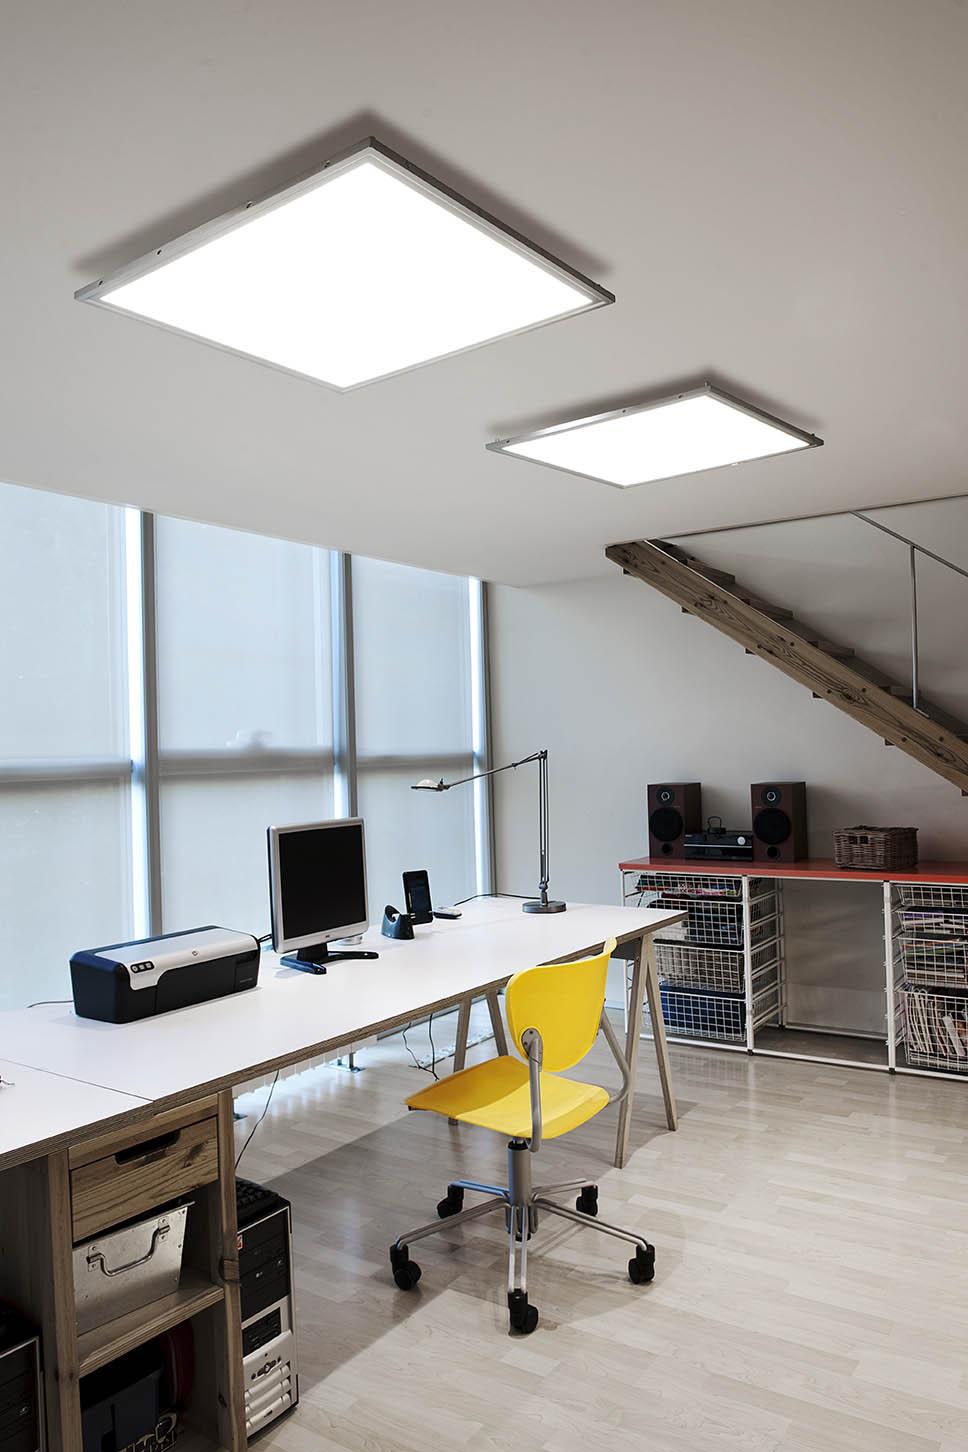 Pujol lofthaus - Iluminacion interior led ...